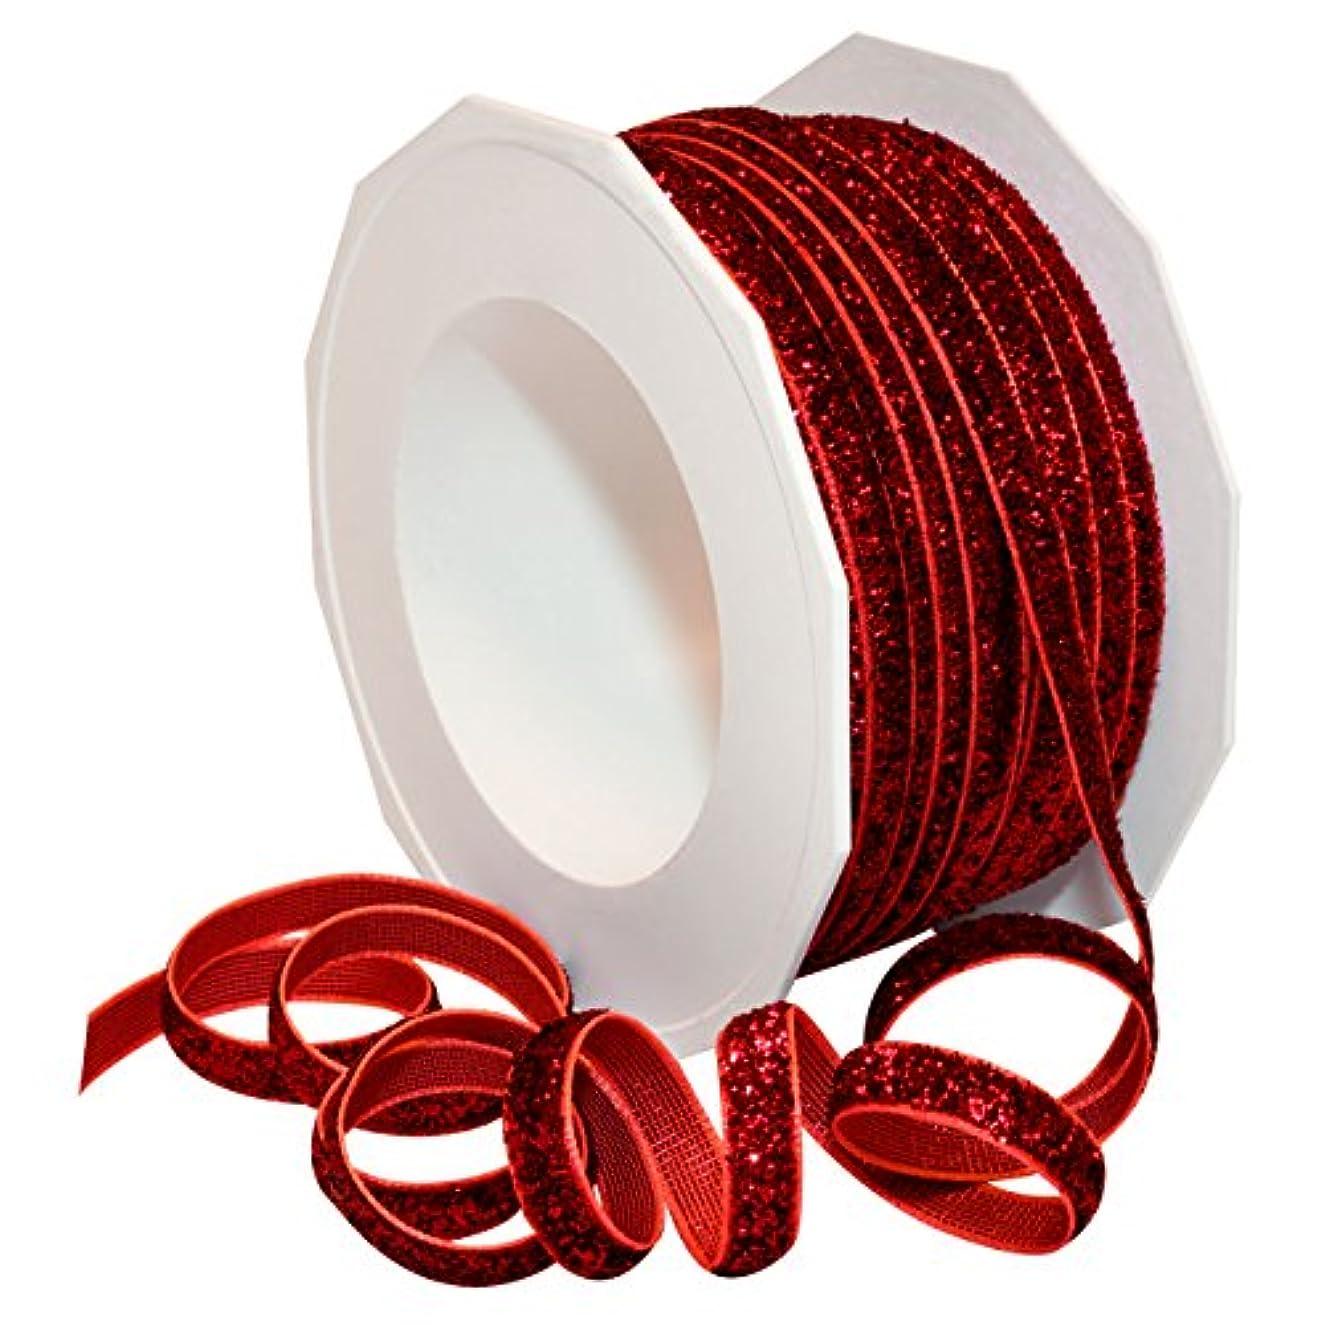 Morex Ribbon 98701/25-609 Metallic Velvet Glitter Ribbon, 1/4-Inch by 25-Yard, Ruby